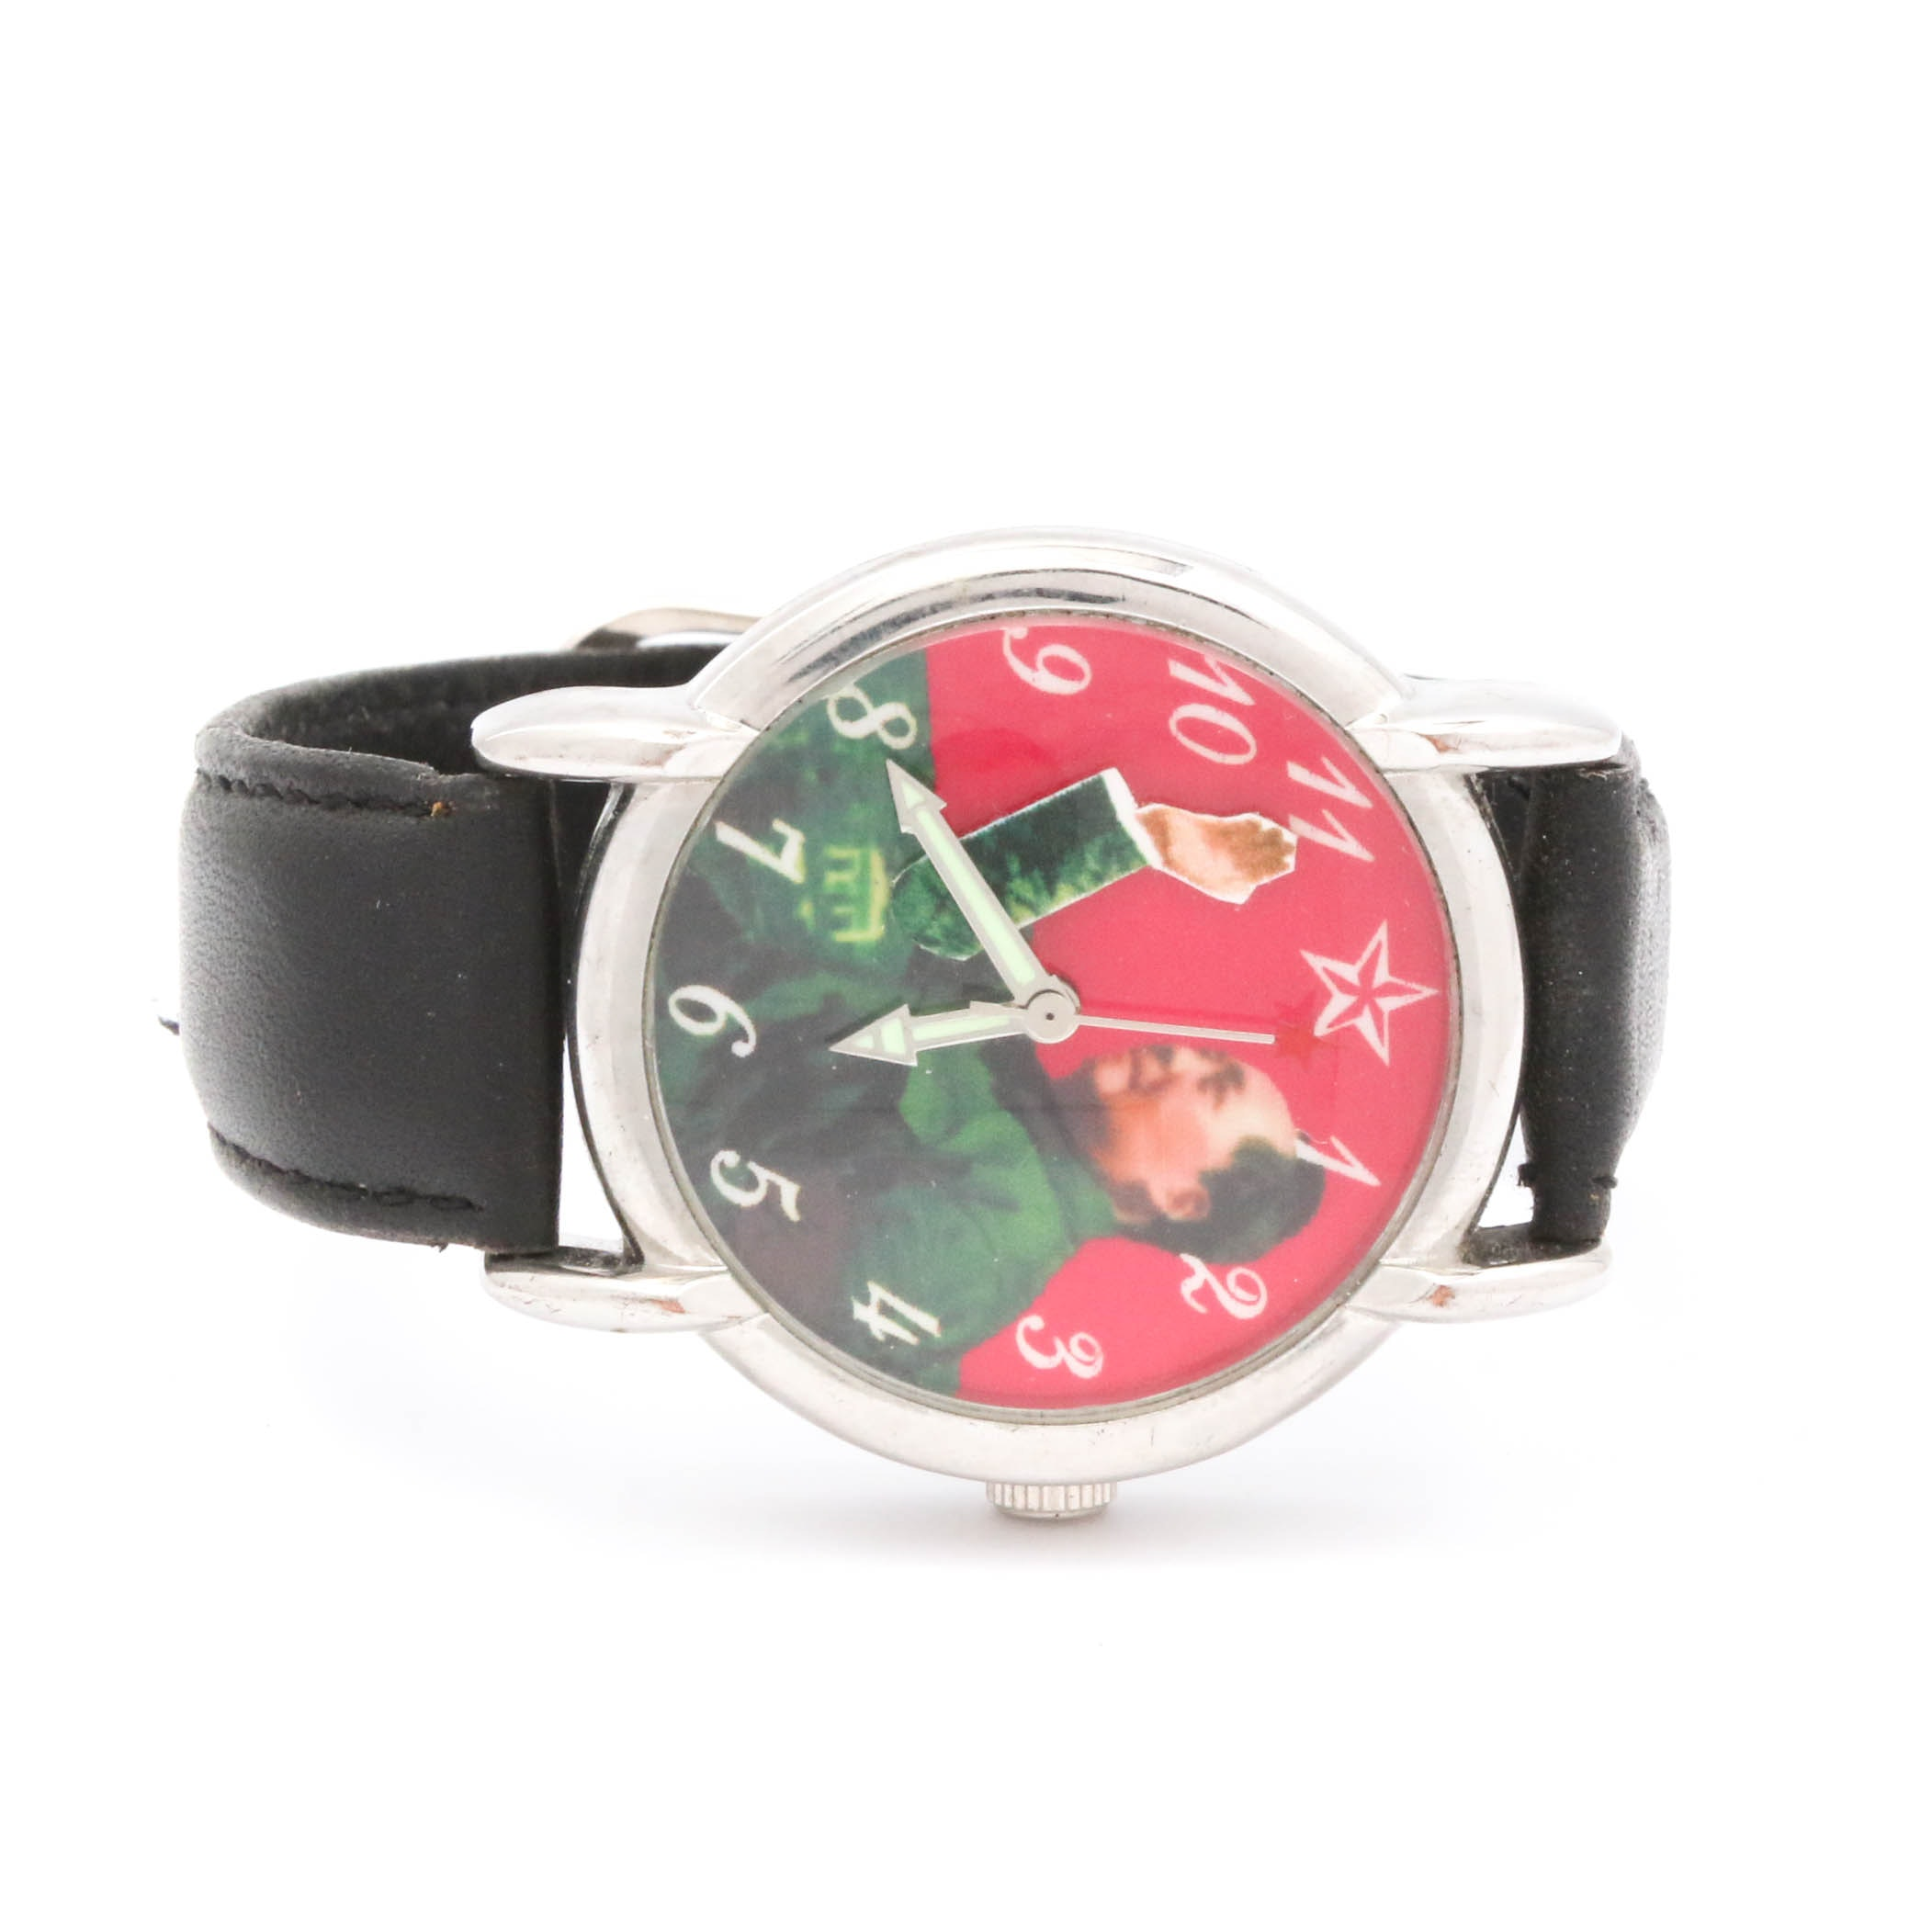 Mao Zedong Stainless Steel Wristwatch